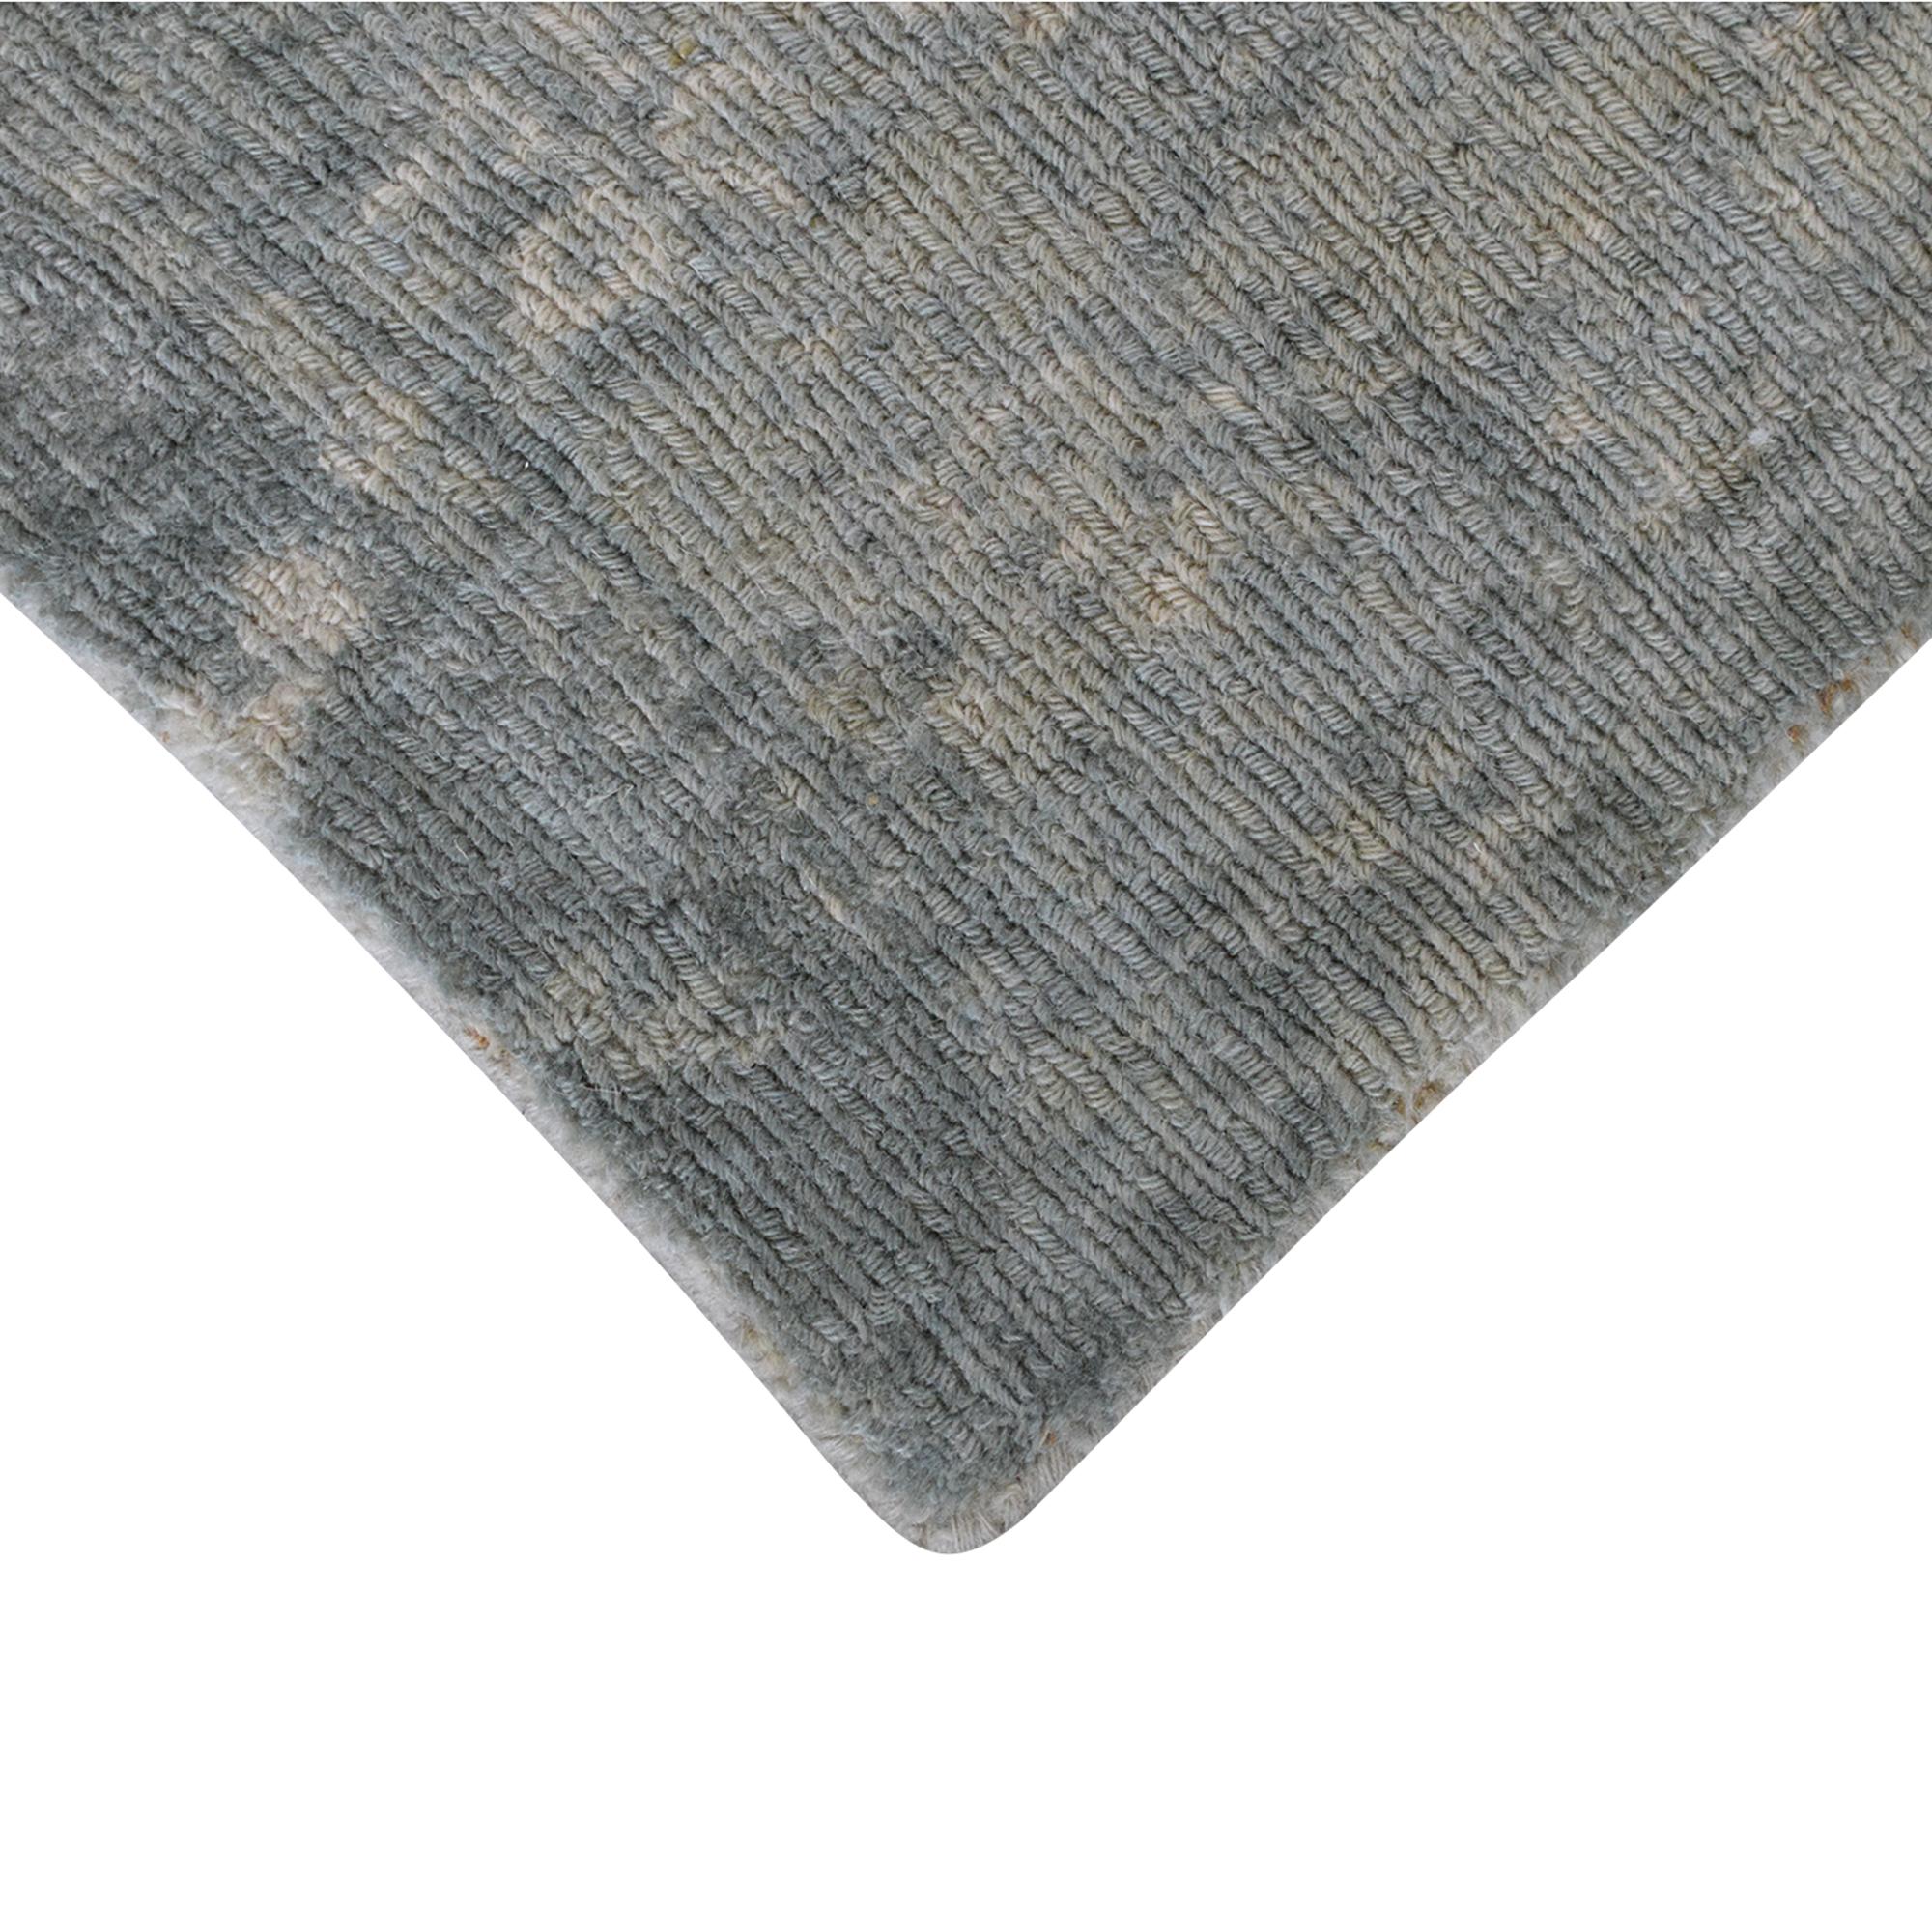 Pottery Barn Kailee Handwoven Wool Rug sale